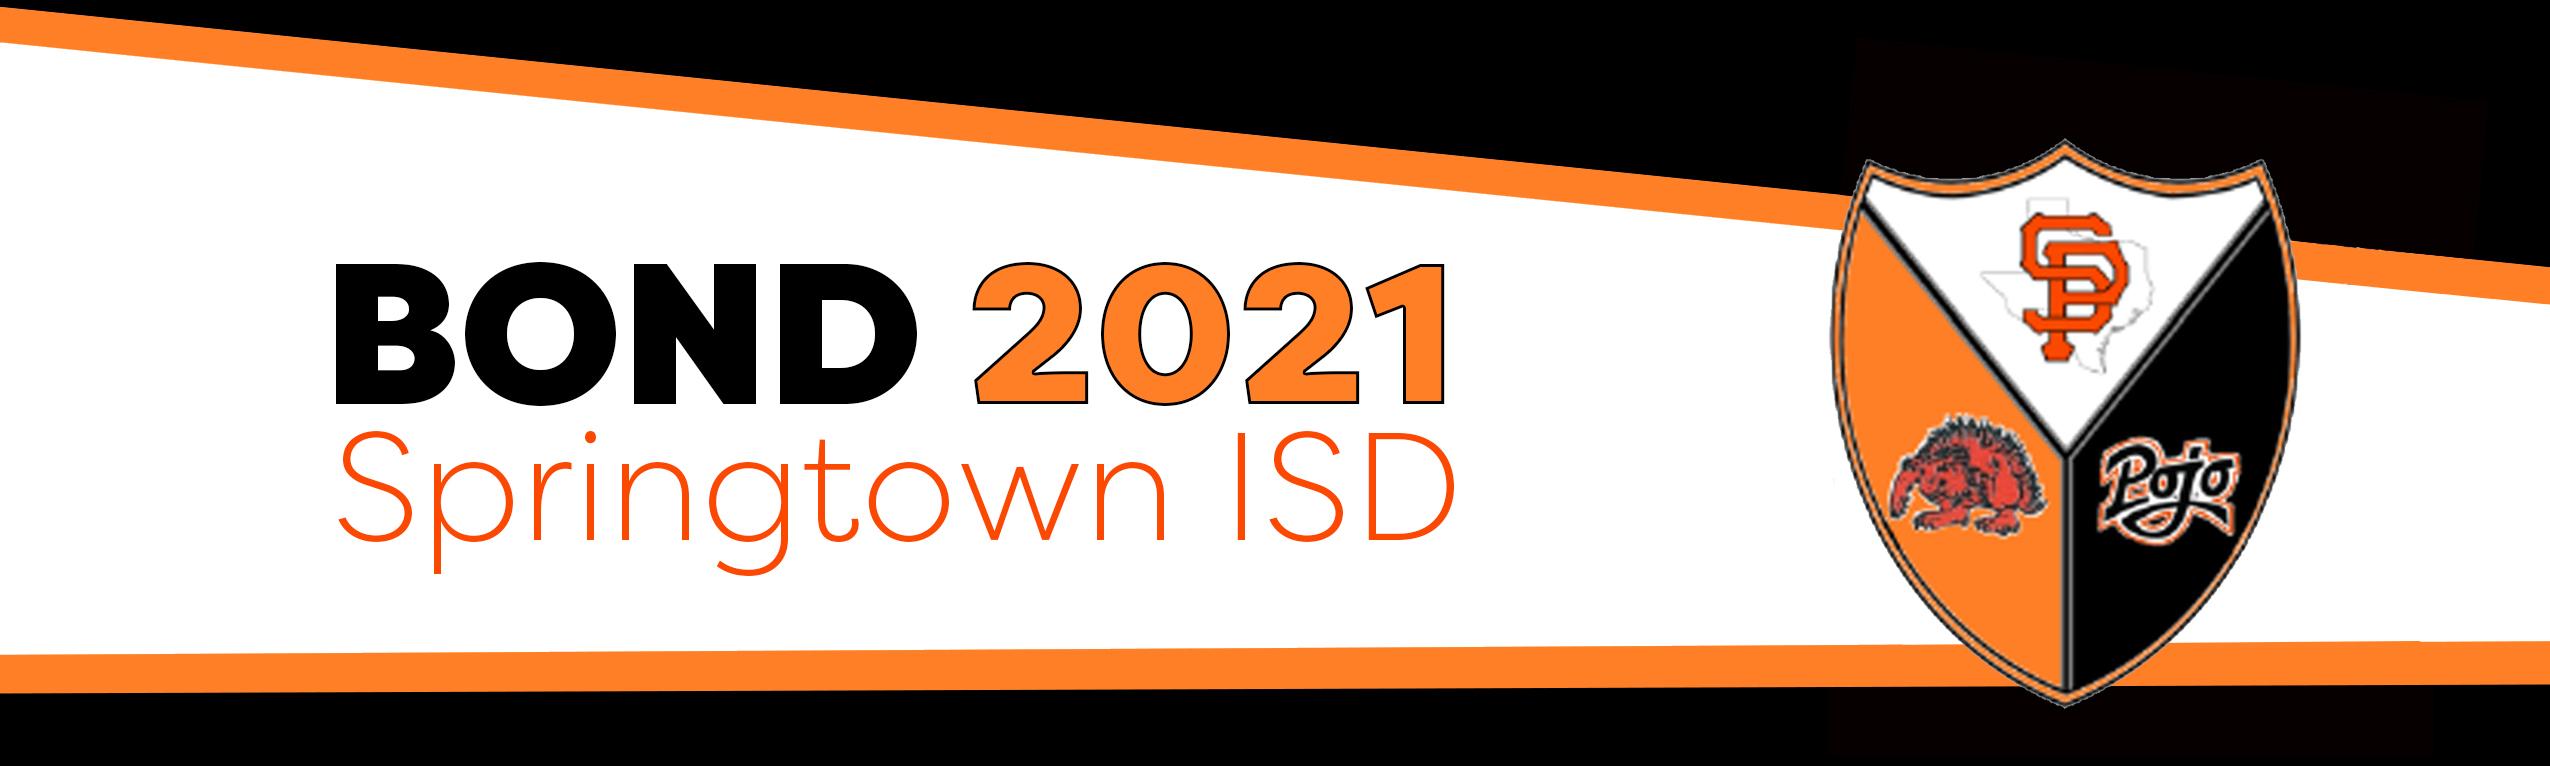 Springtown ISD Bond 2021